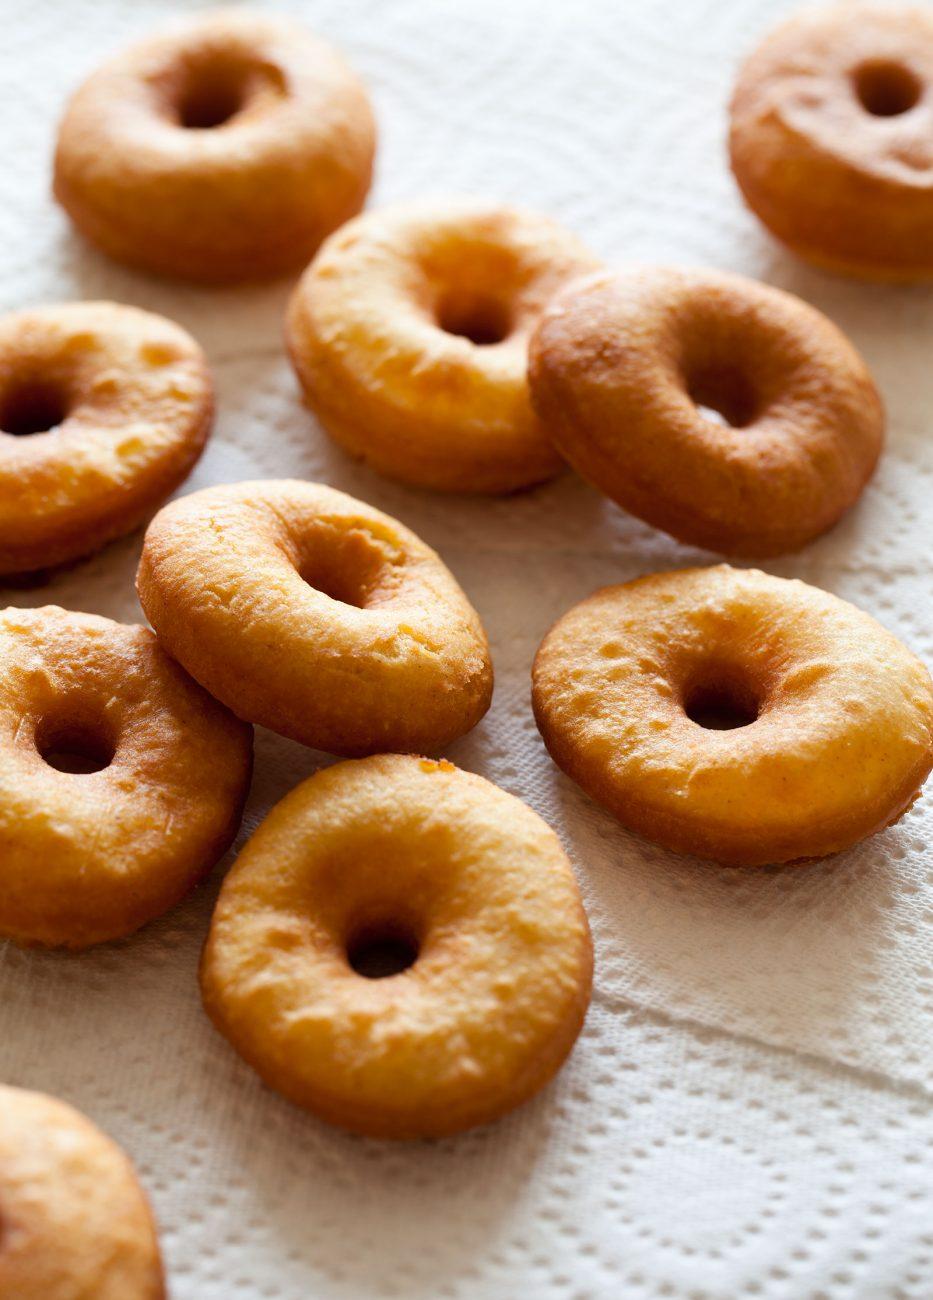 Bites Sized Cake Donuts